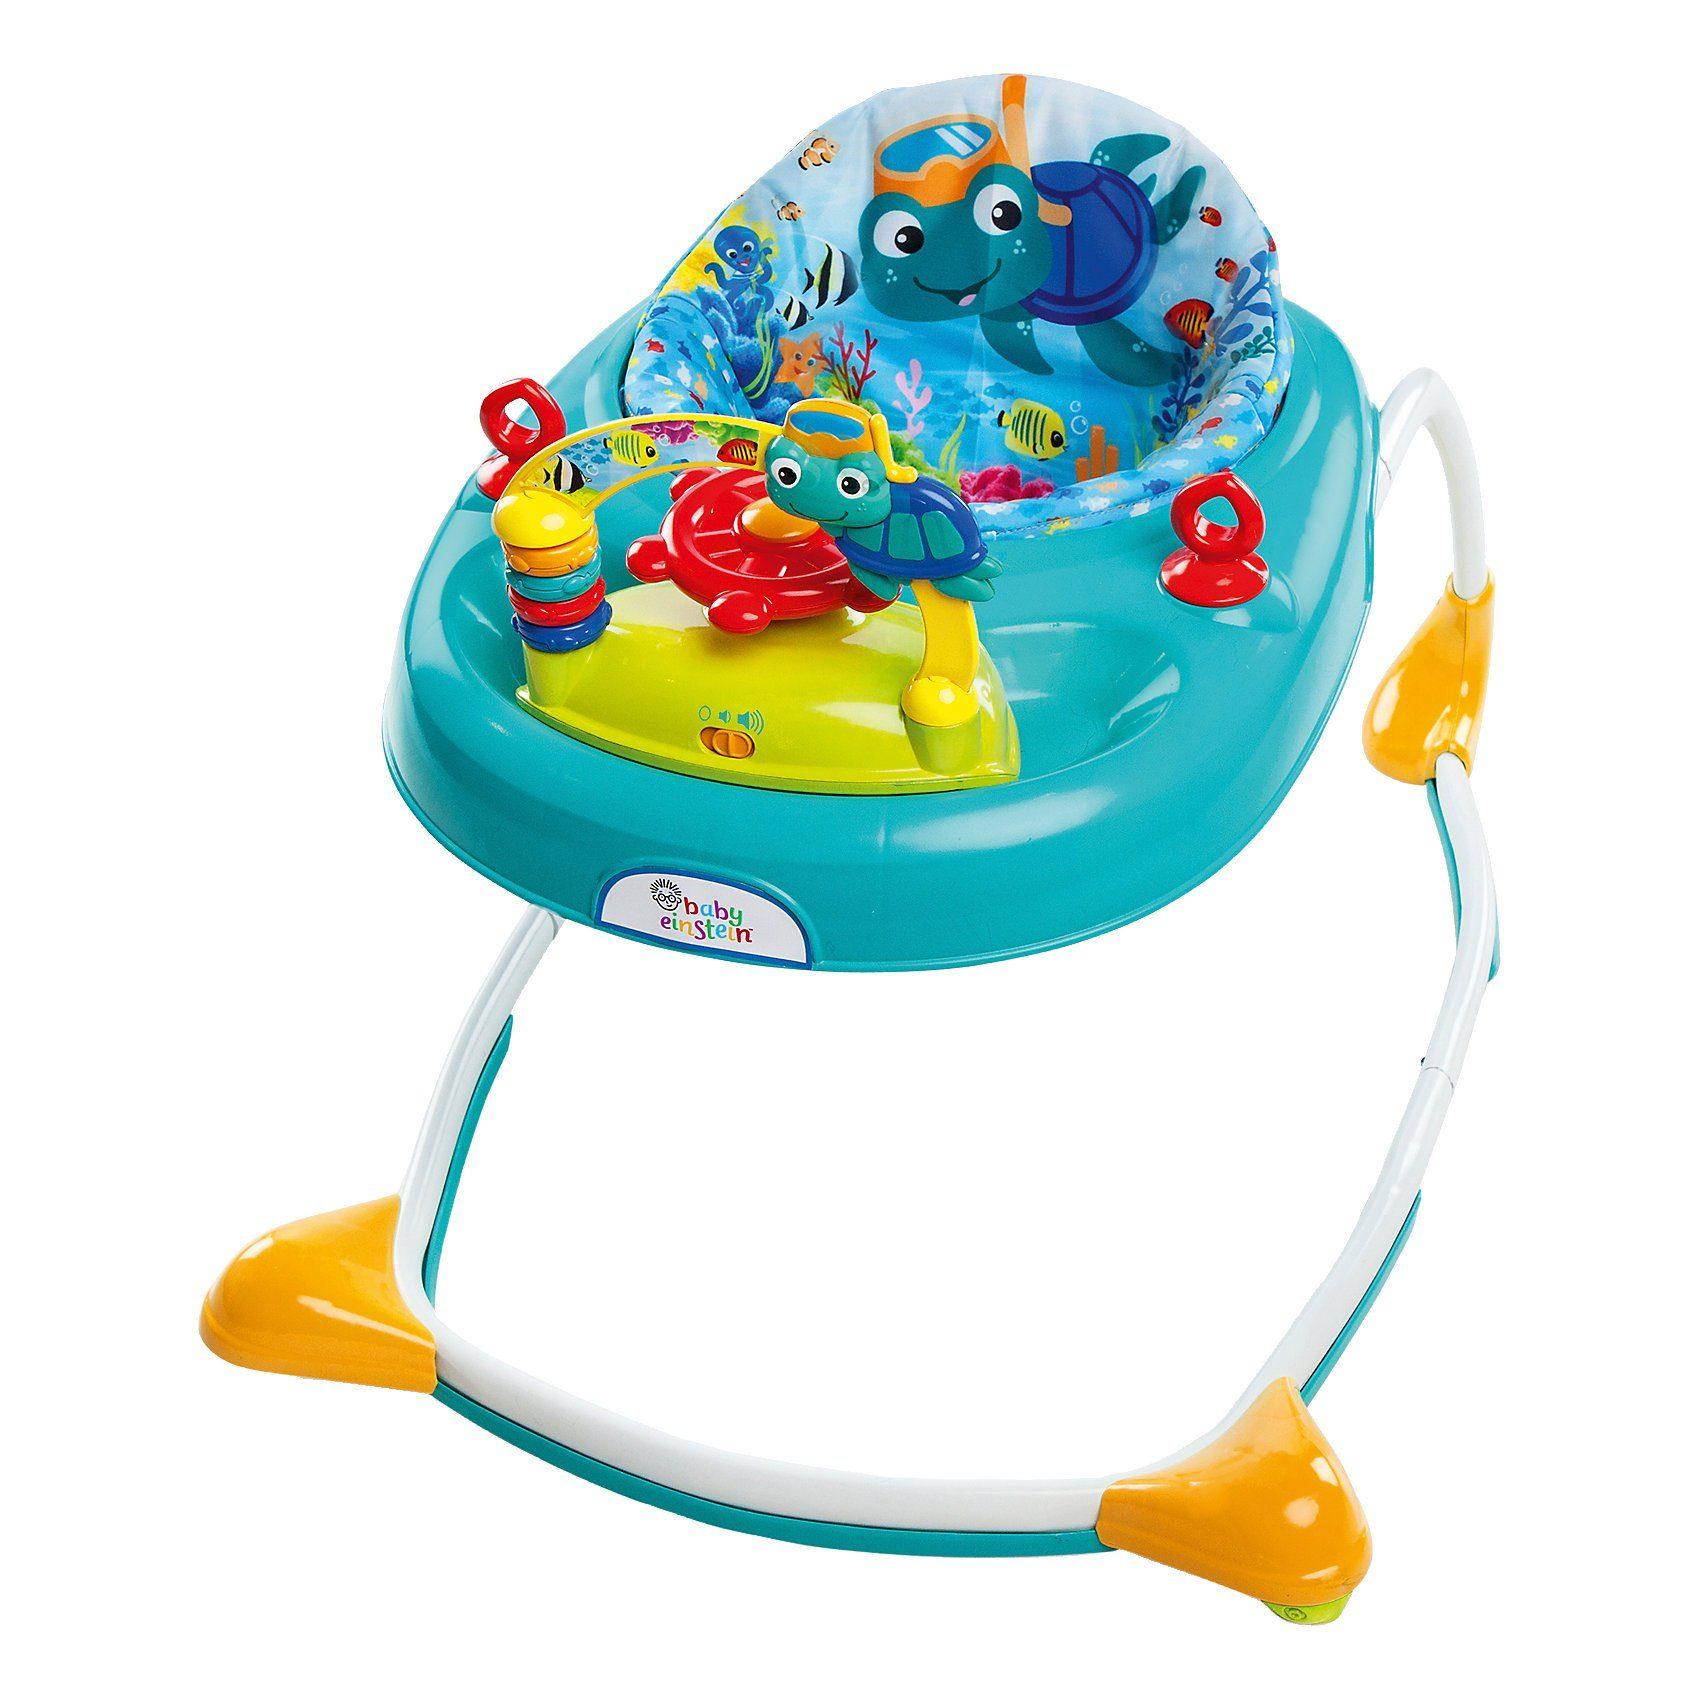 Kids II Lauflernhilfe, Baby Neptune